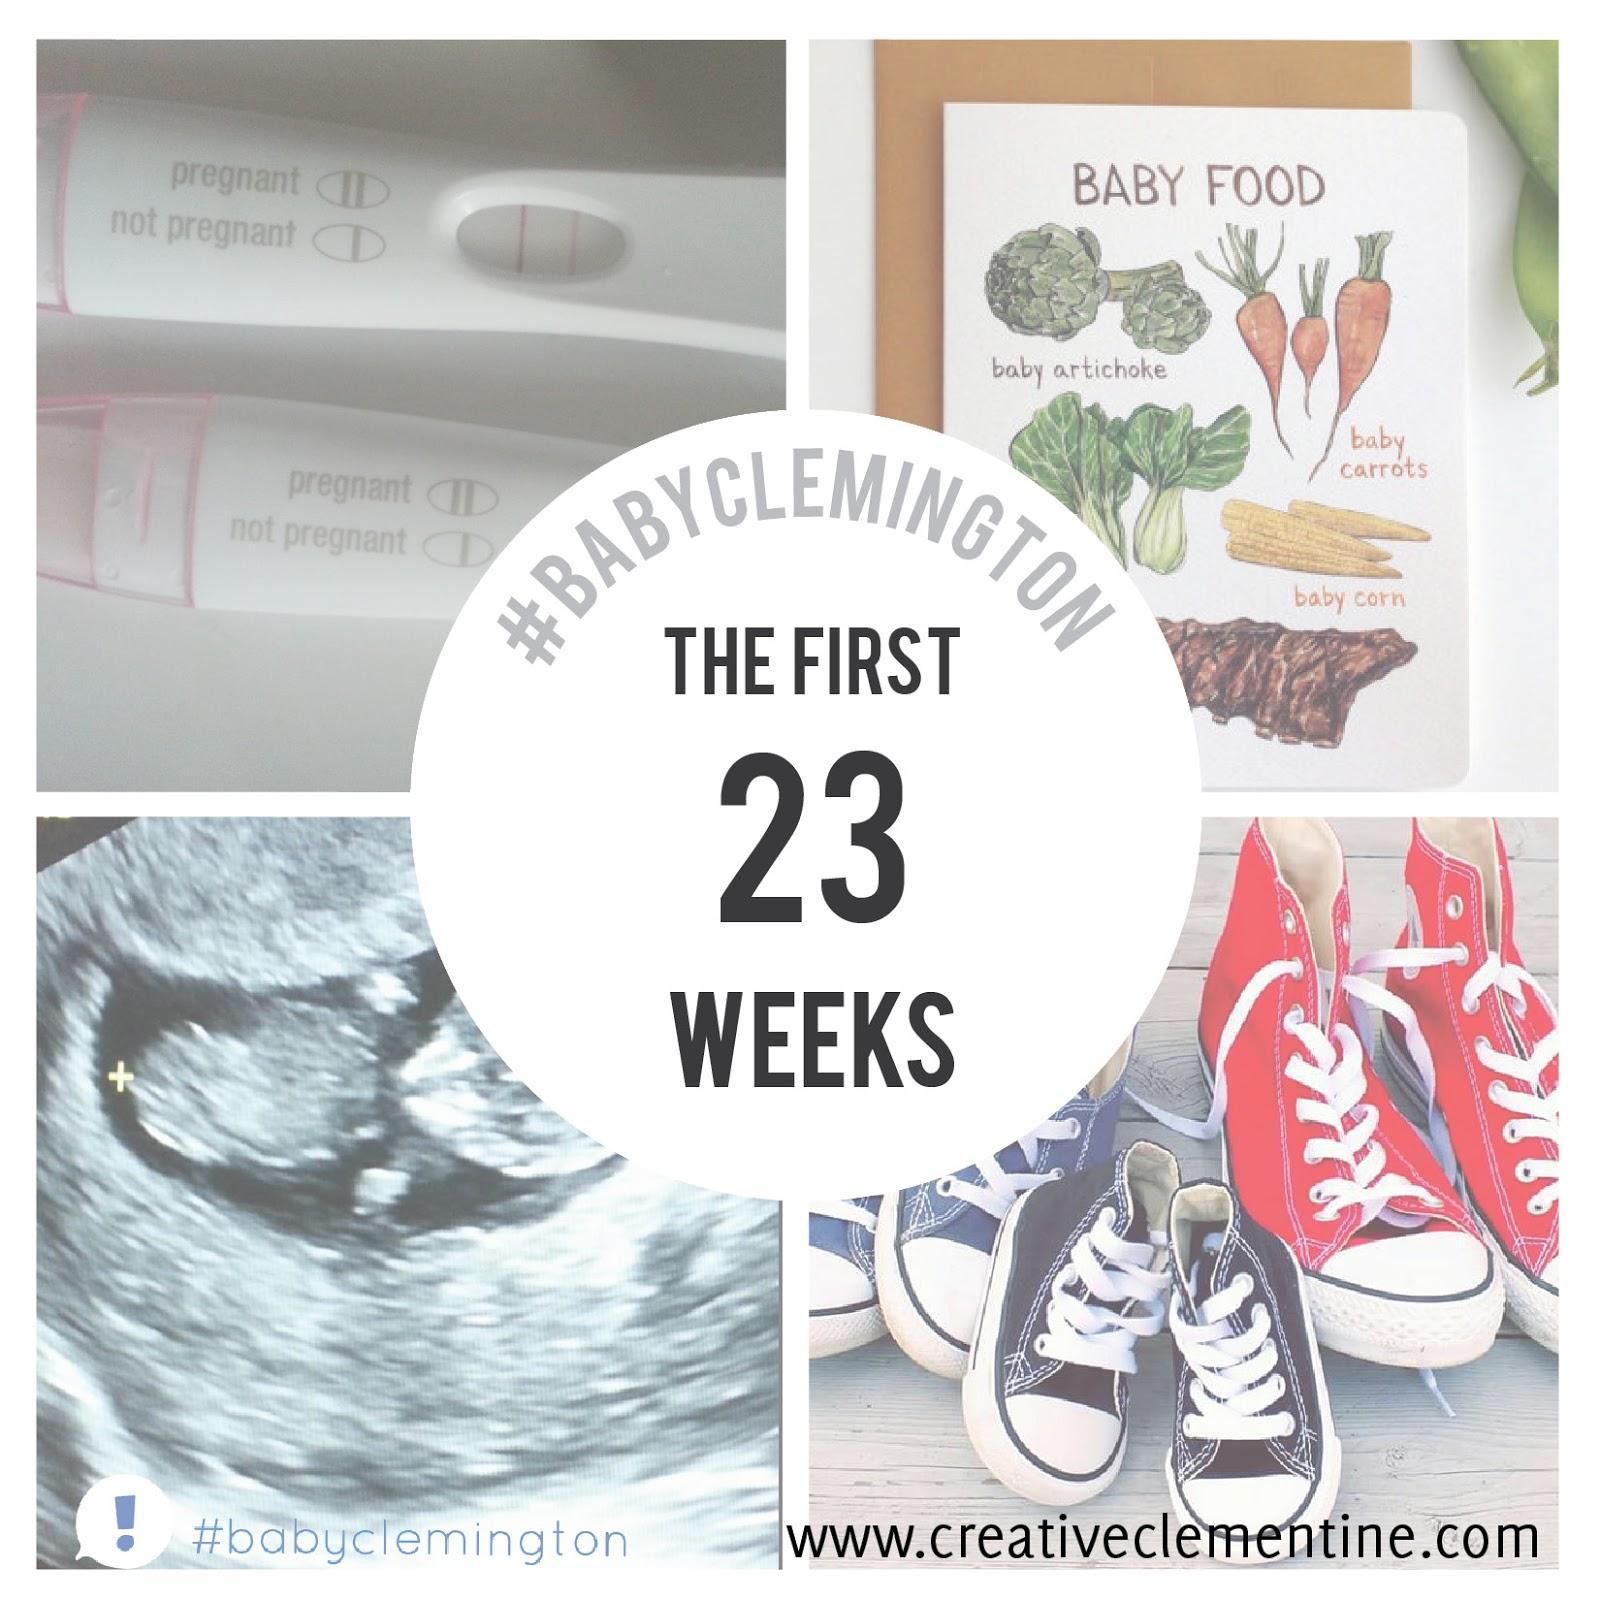 #BabyClemington Pregnancy Update: 23 weeks down, 17 to go.